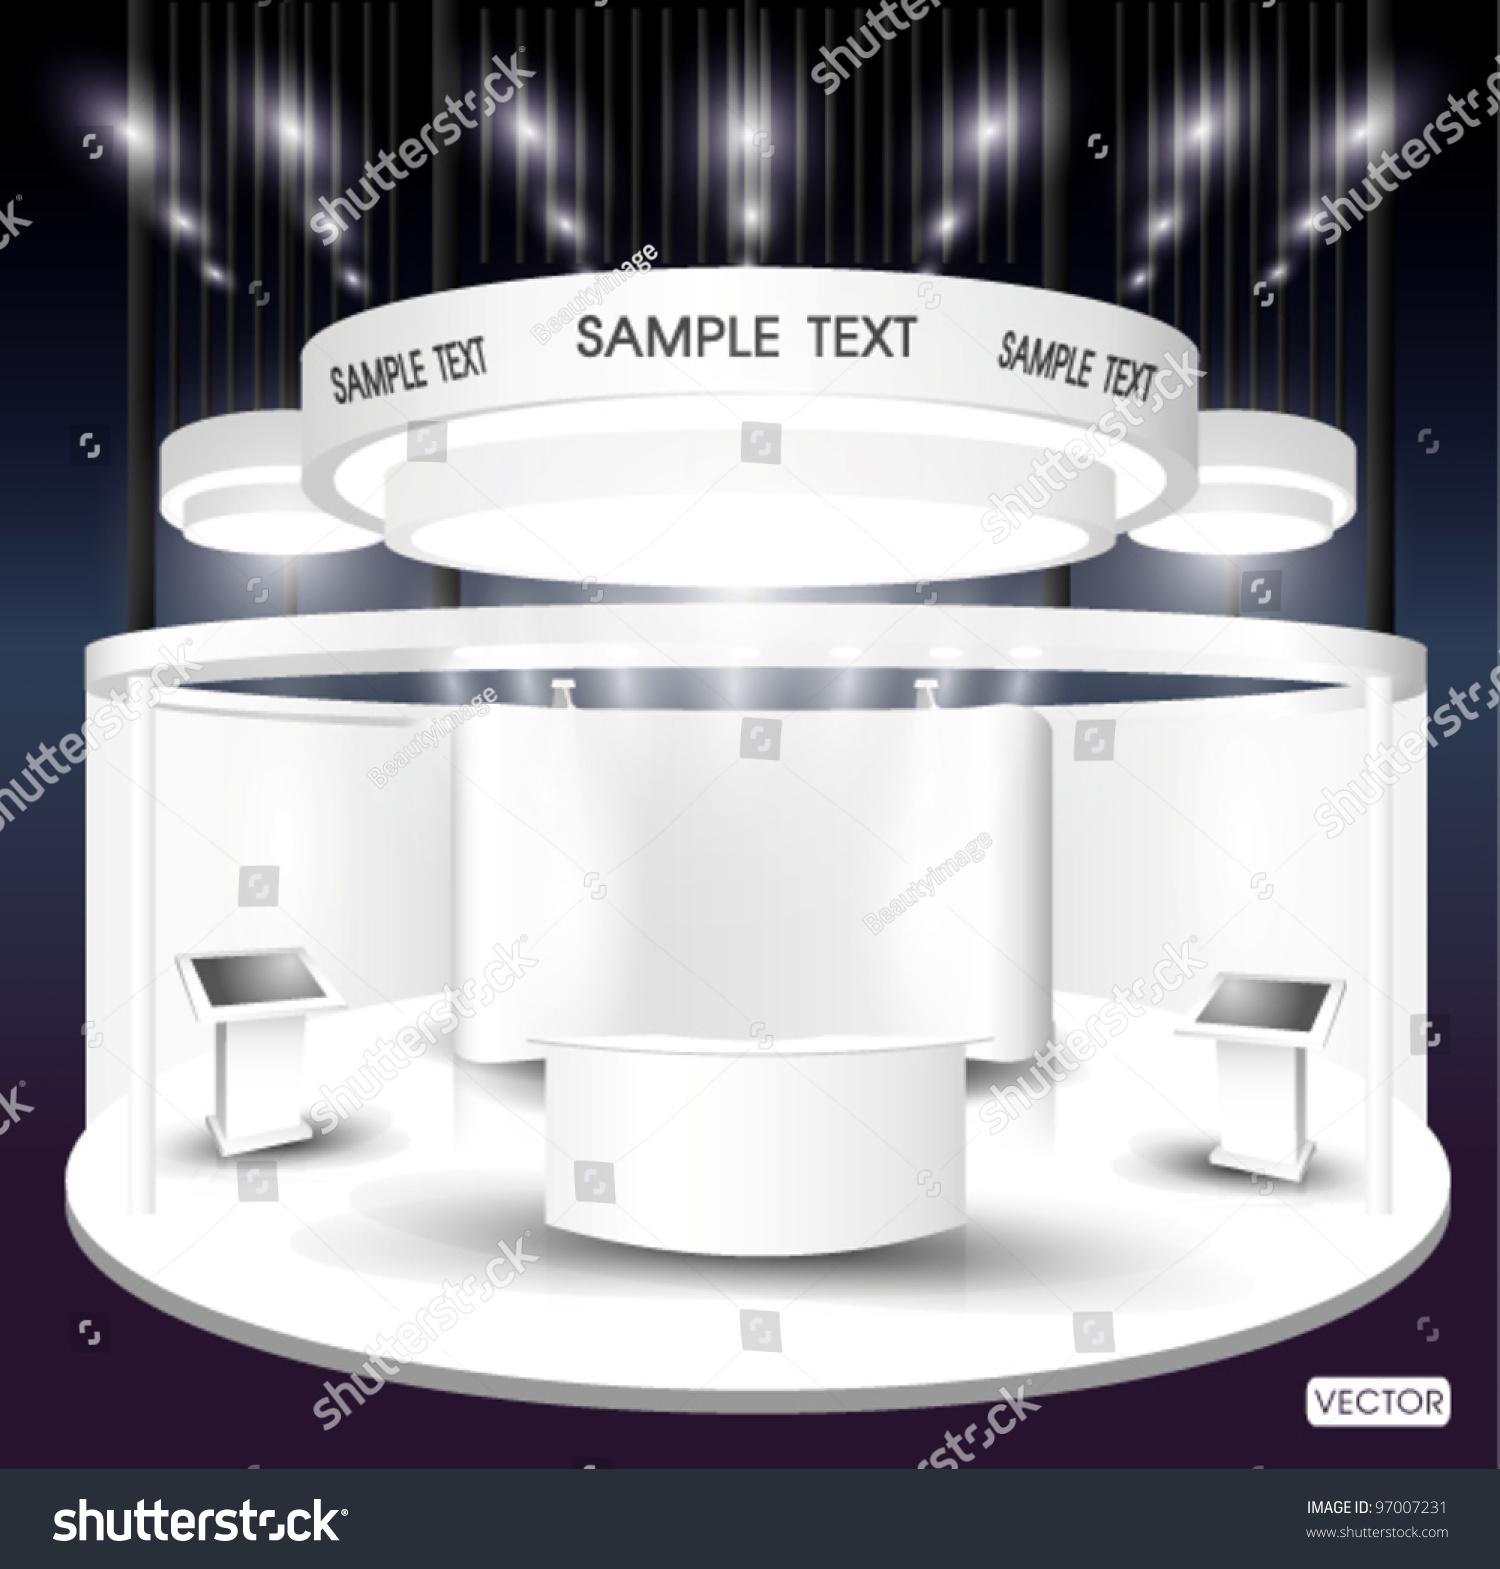 Exhibition Booth Vector : Premium exhibition booth stock vector shutterstock